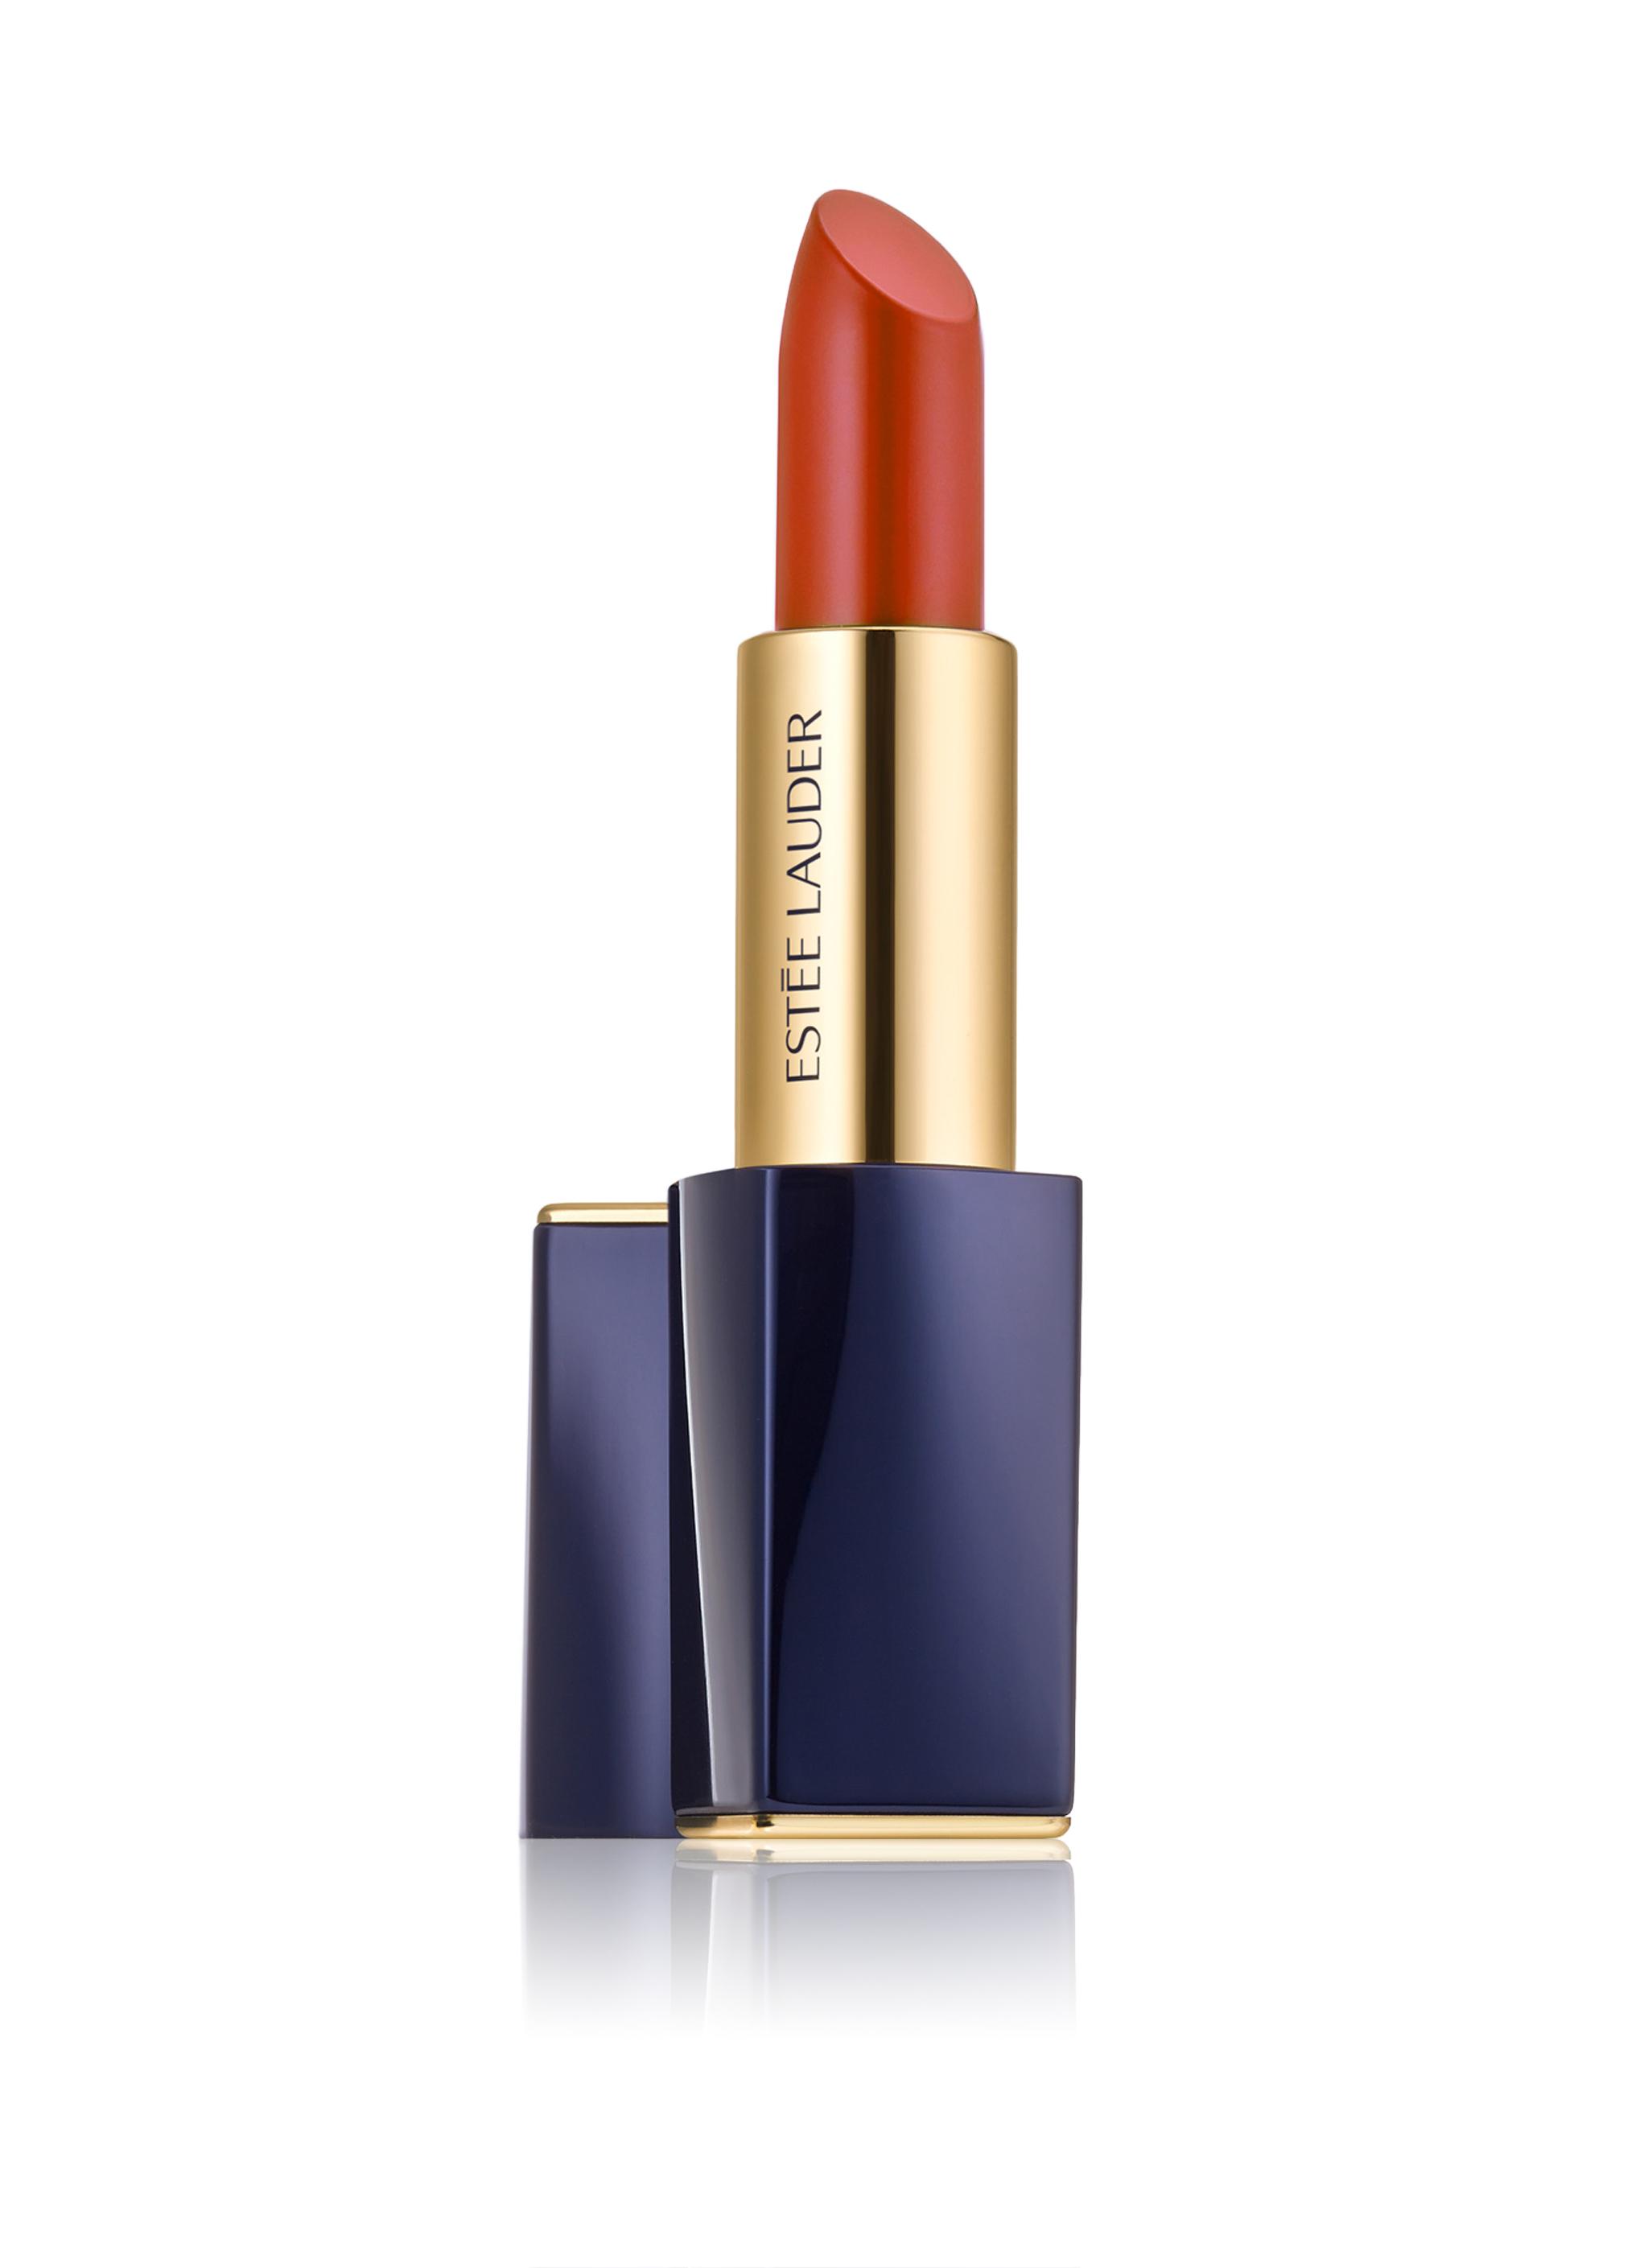 Pure Color Envy Matte Sculpting Lipstick 333Persuasive